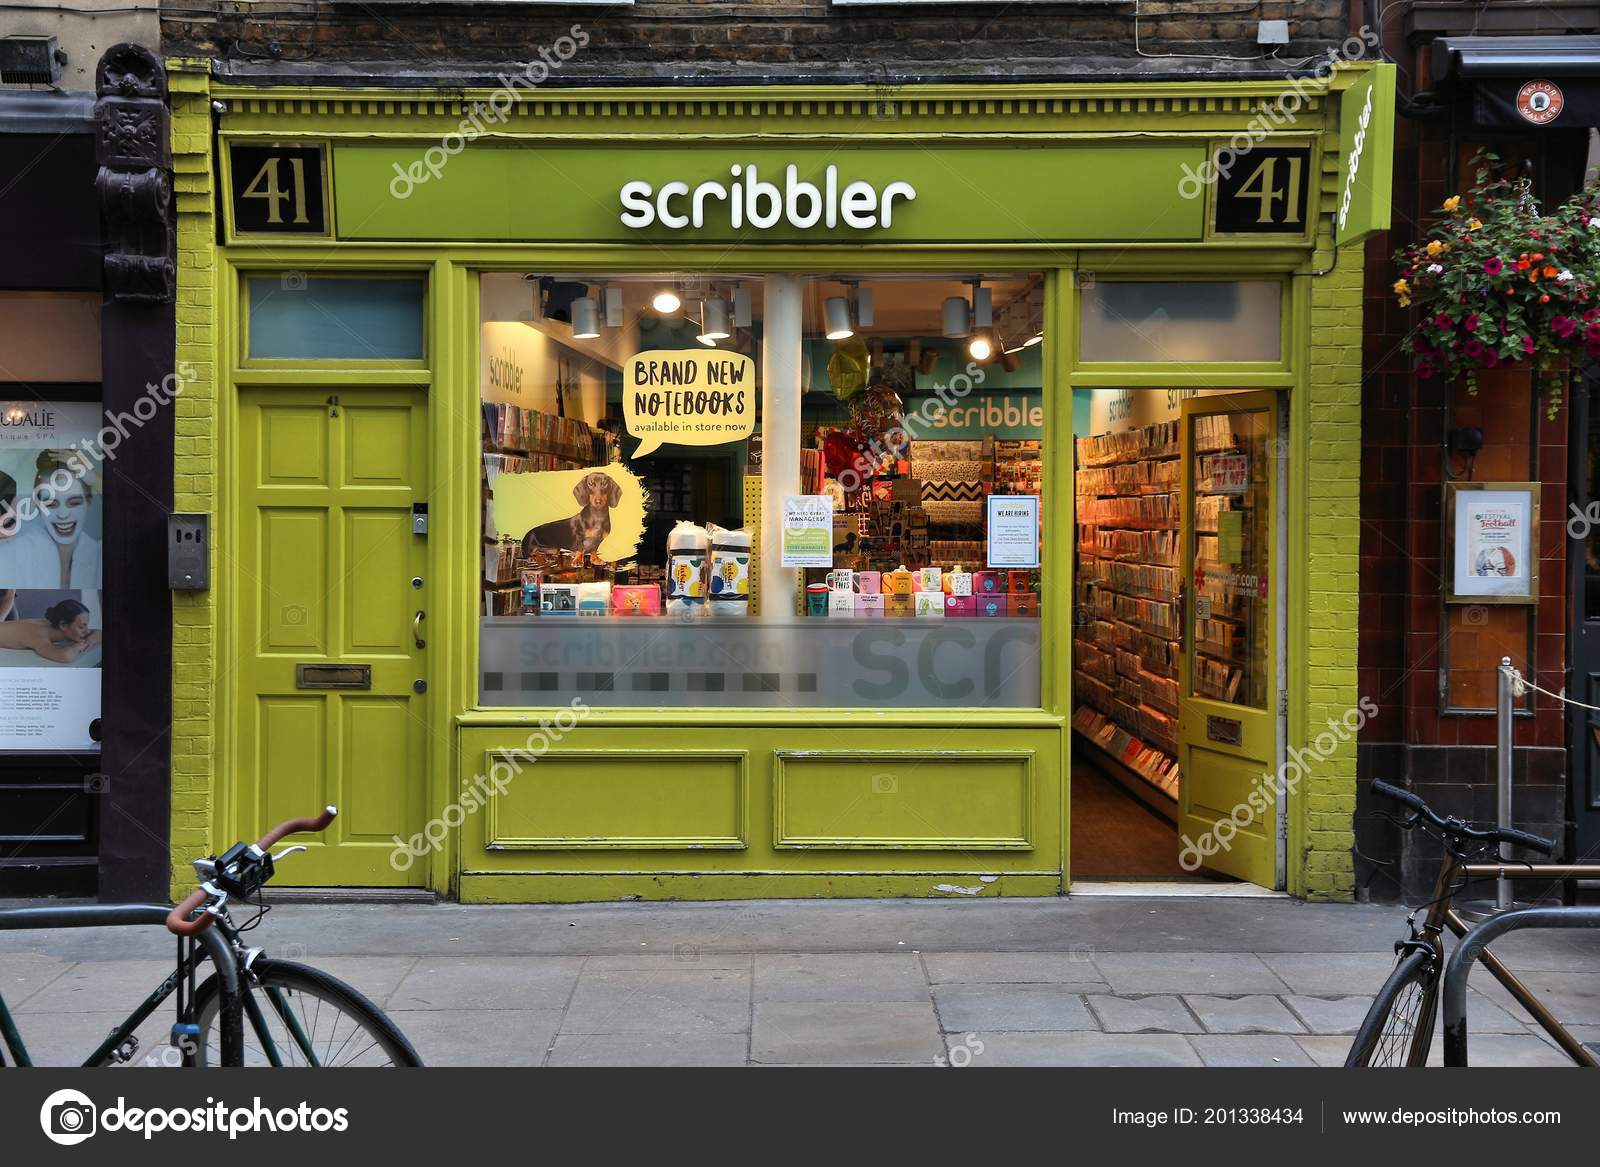 London July 2016 People Shop Scribbler Greeting Card Store London